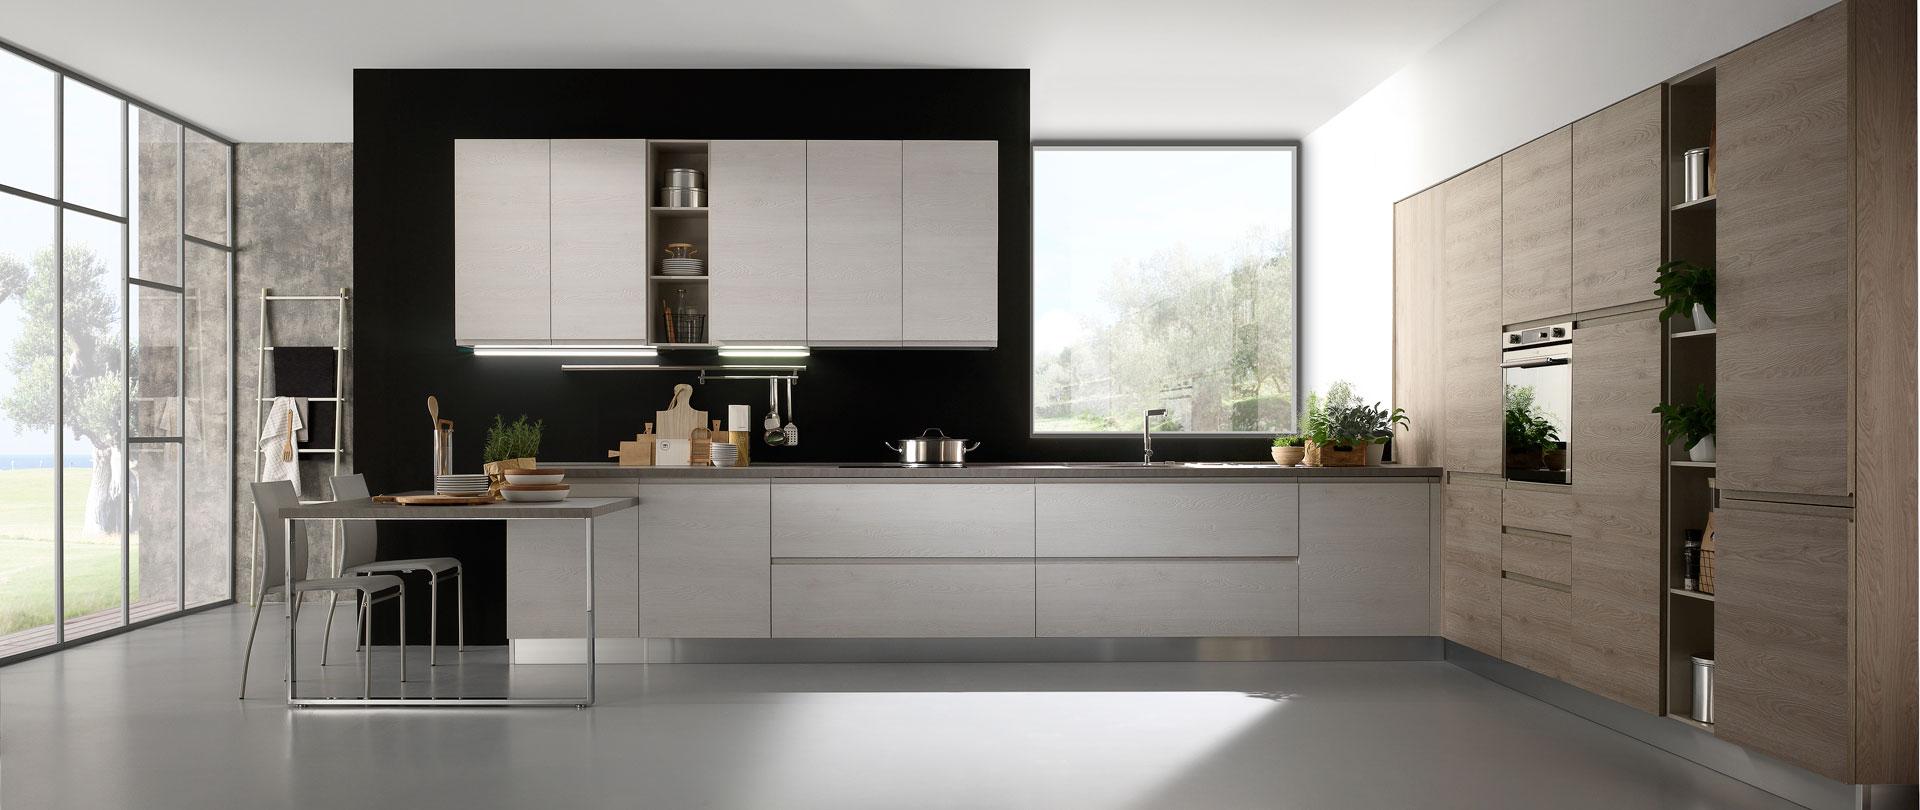 Cucine Componibili Con Angolo luna - cucina moderna mobilturi - arredi 2000